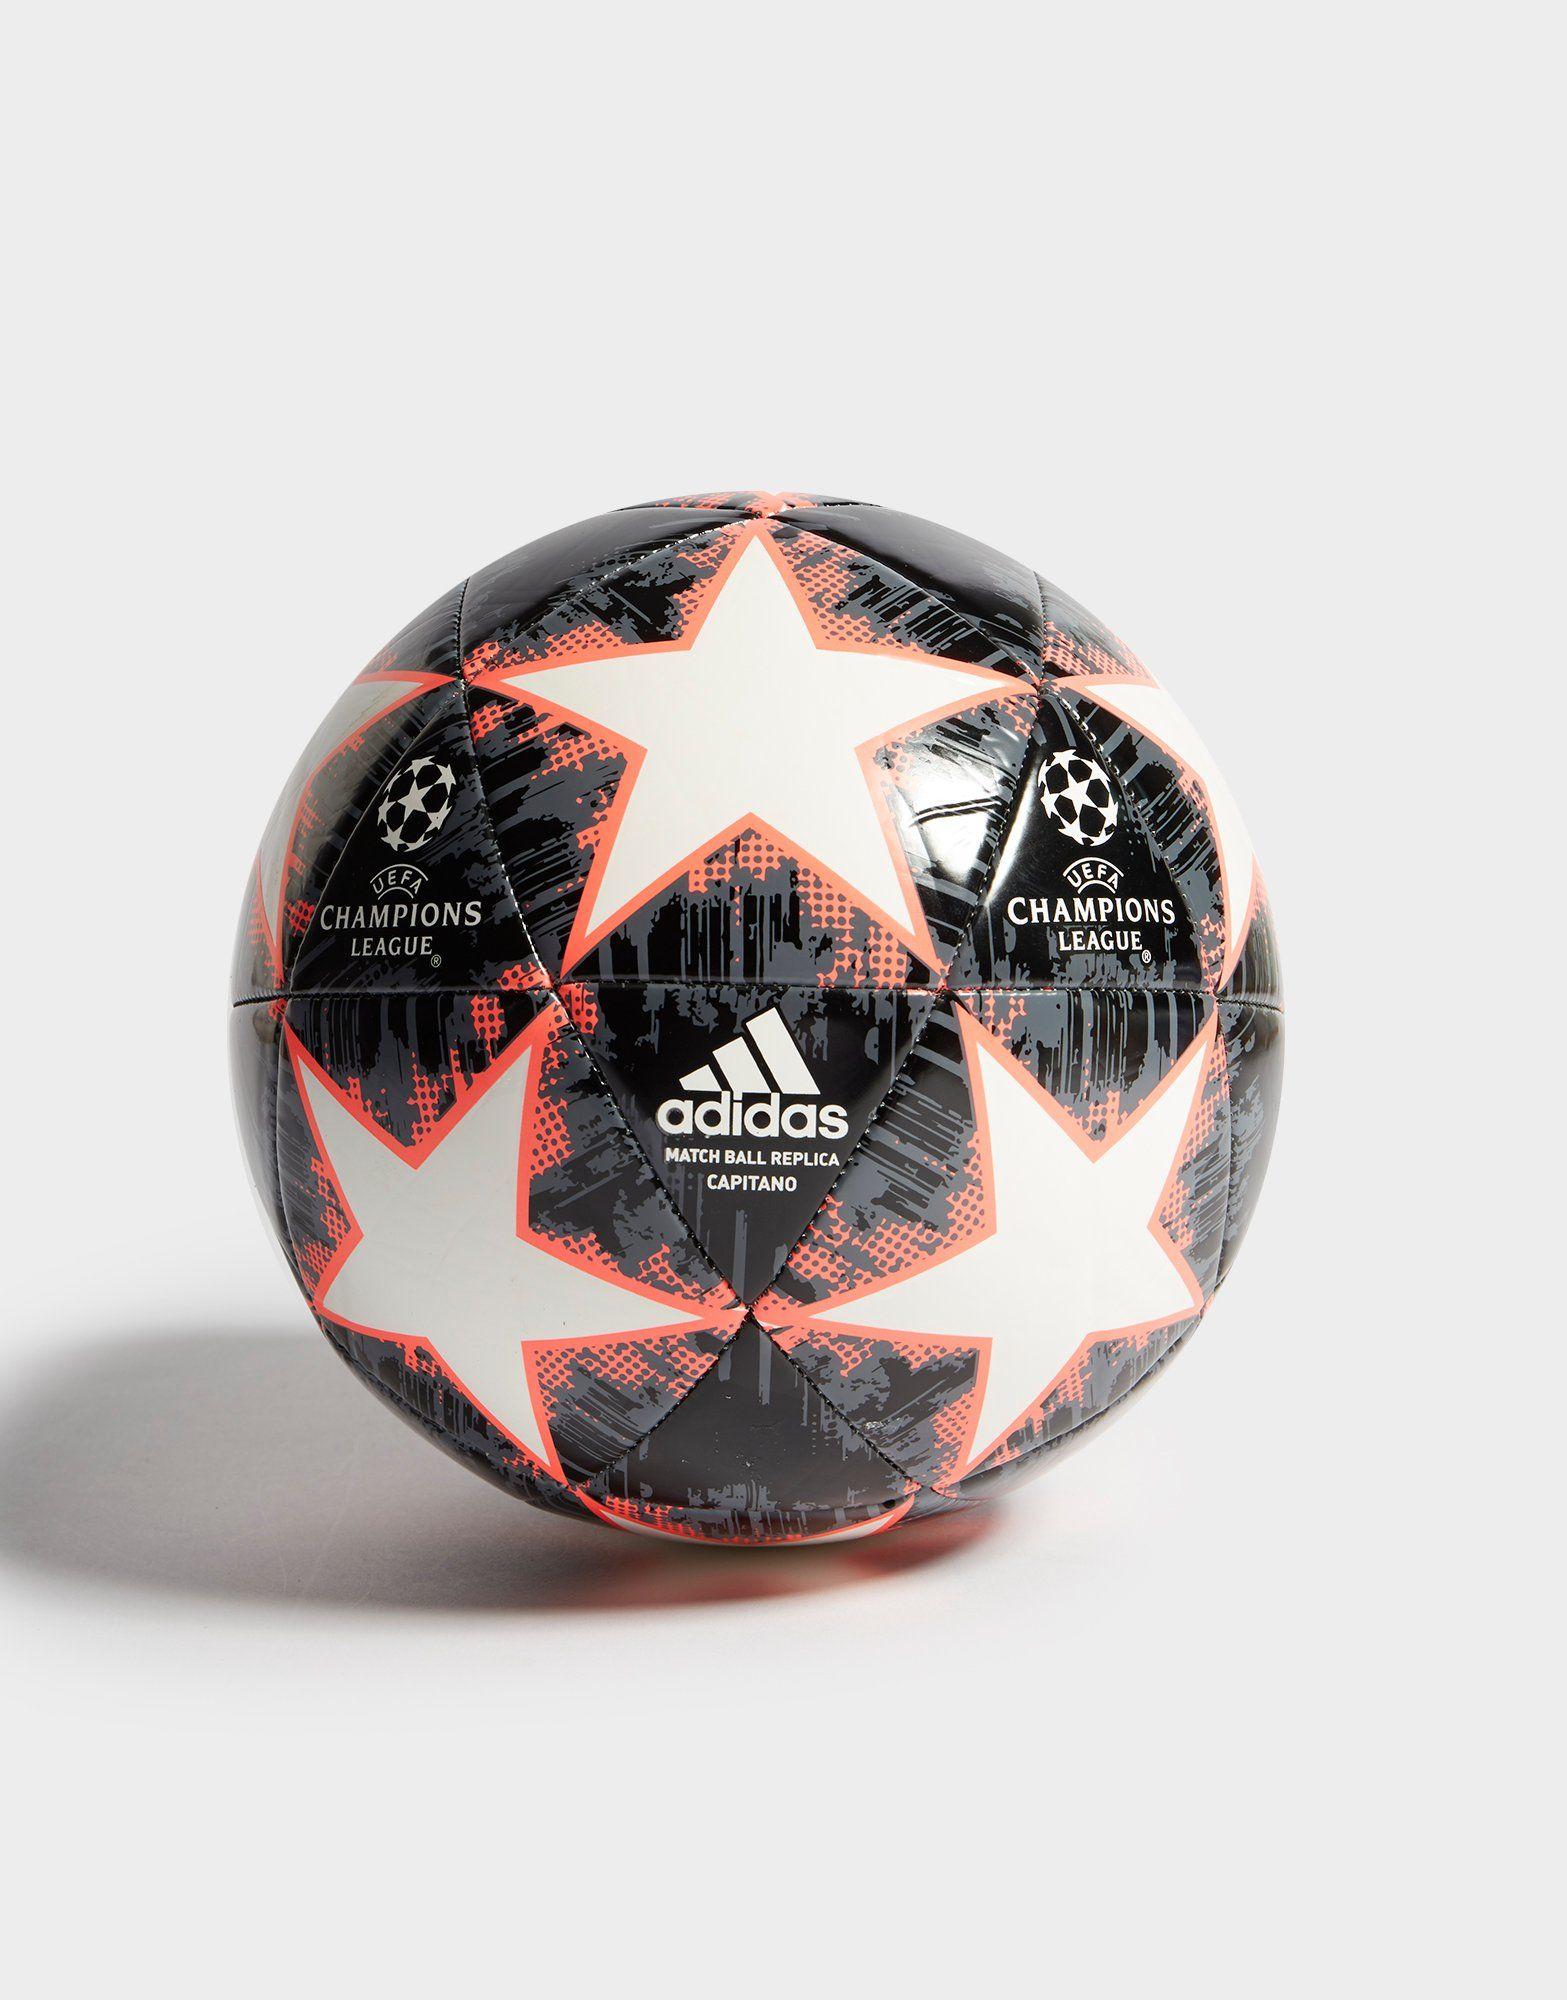 575c21901cf adidas Champions League Finale 2018 19 Football